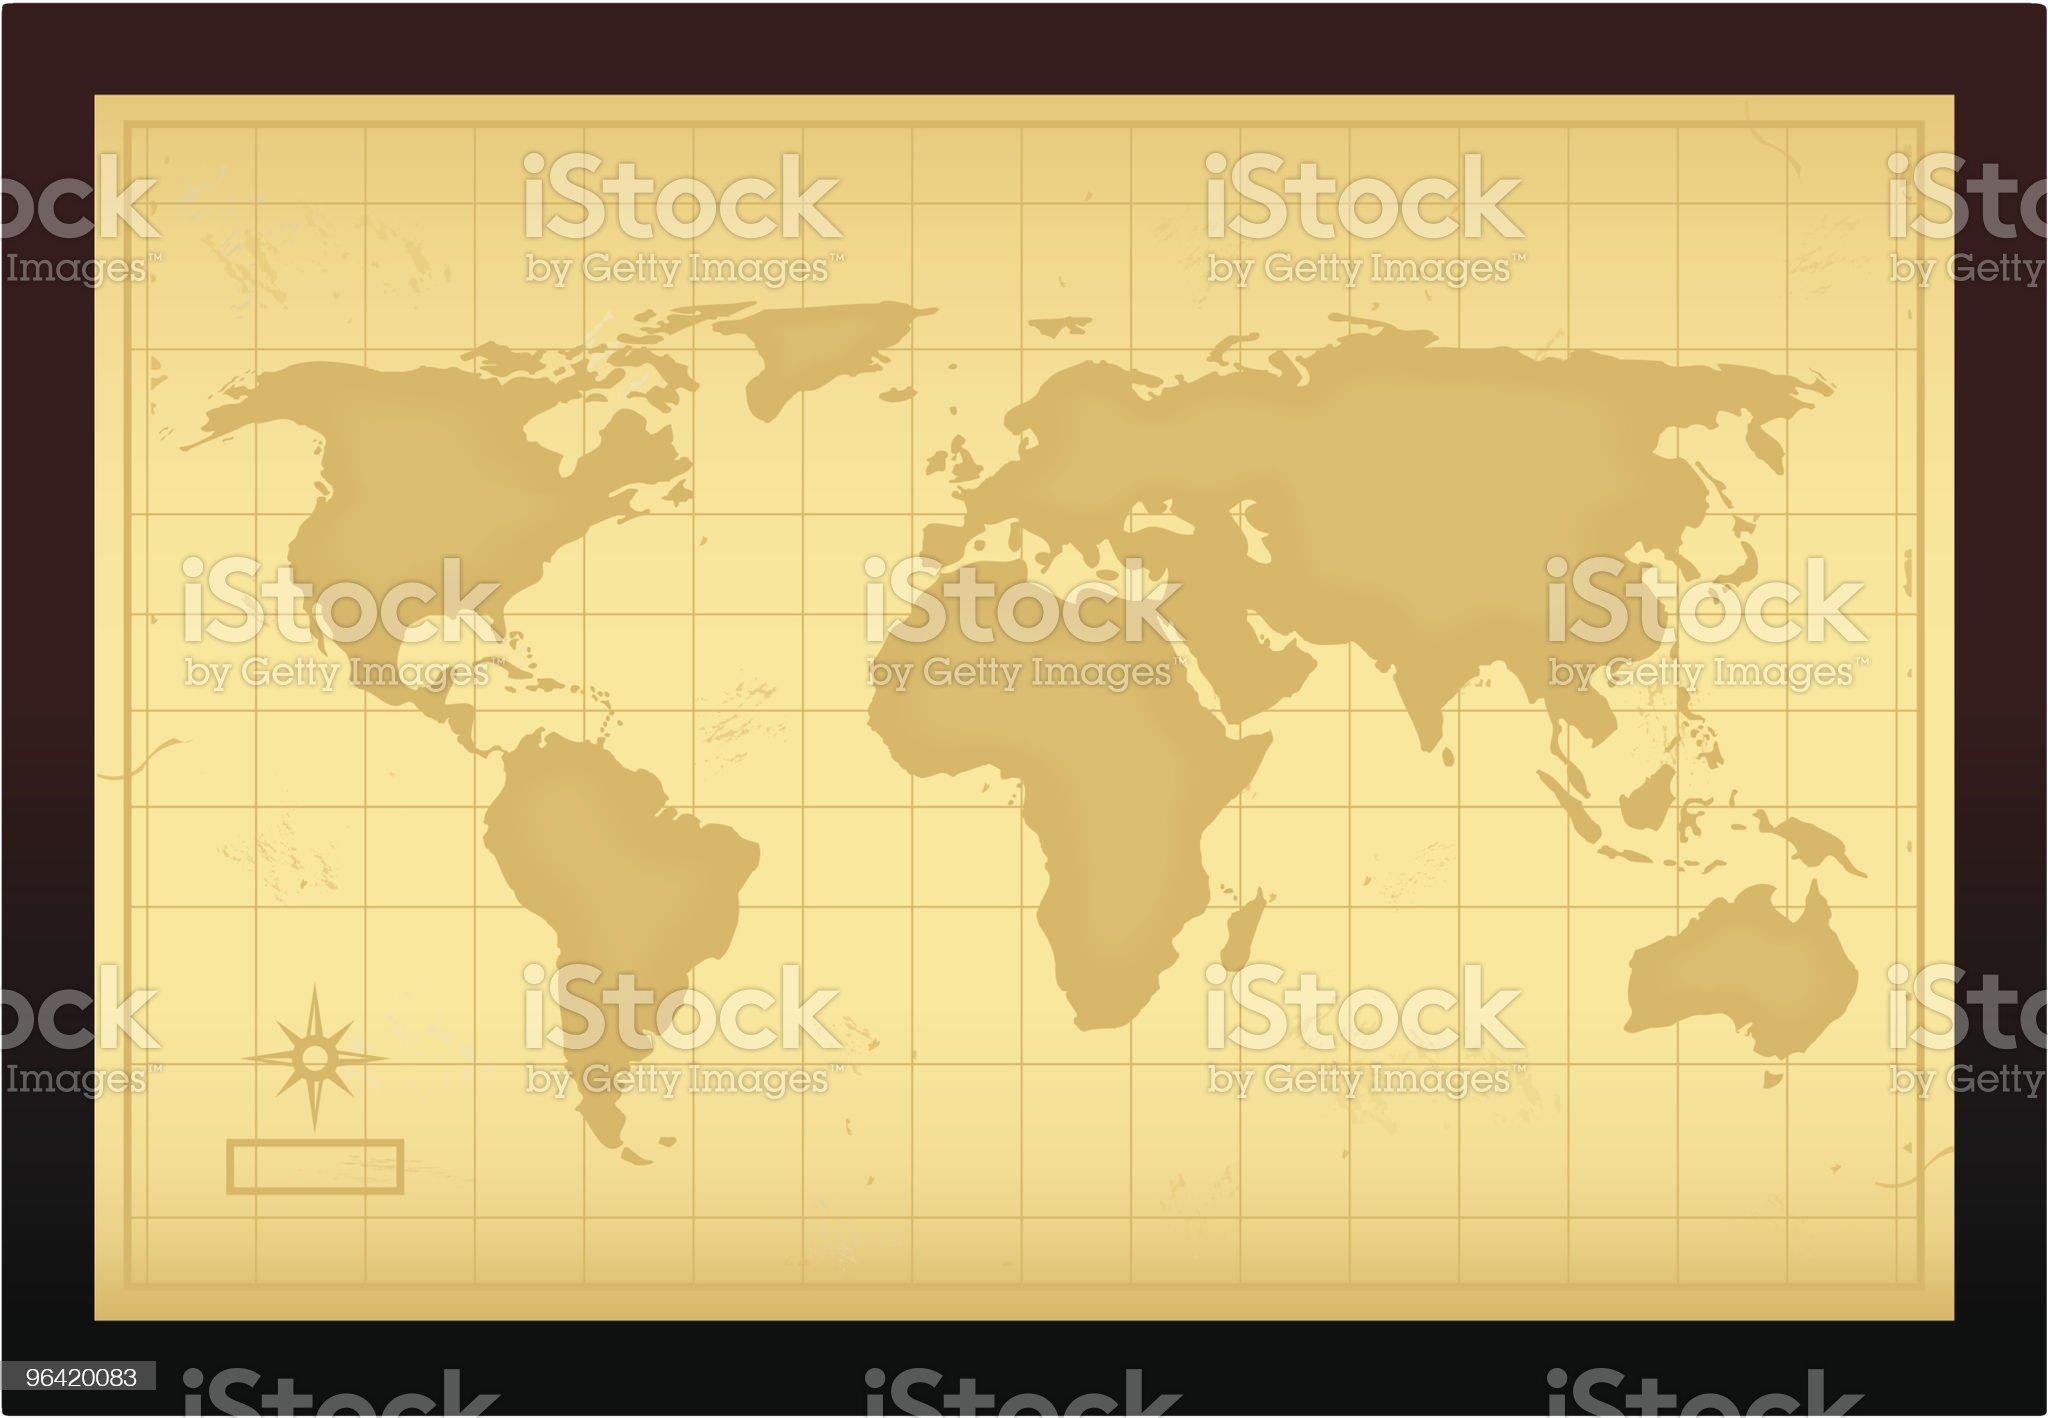 Vintage World Map royalty-free stock vector art